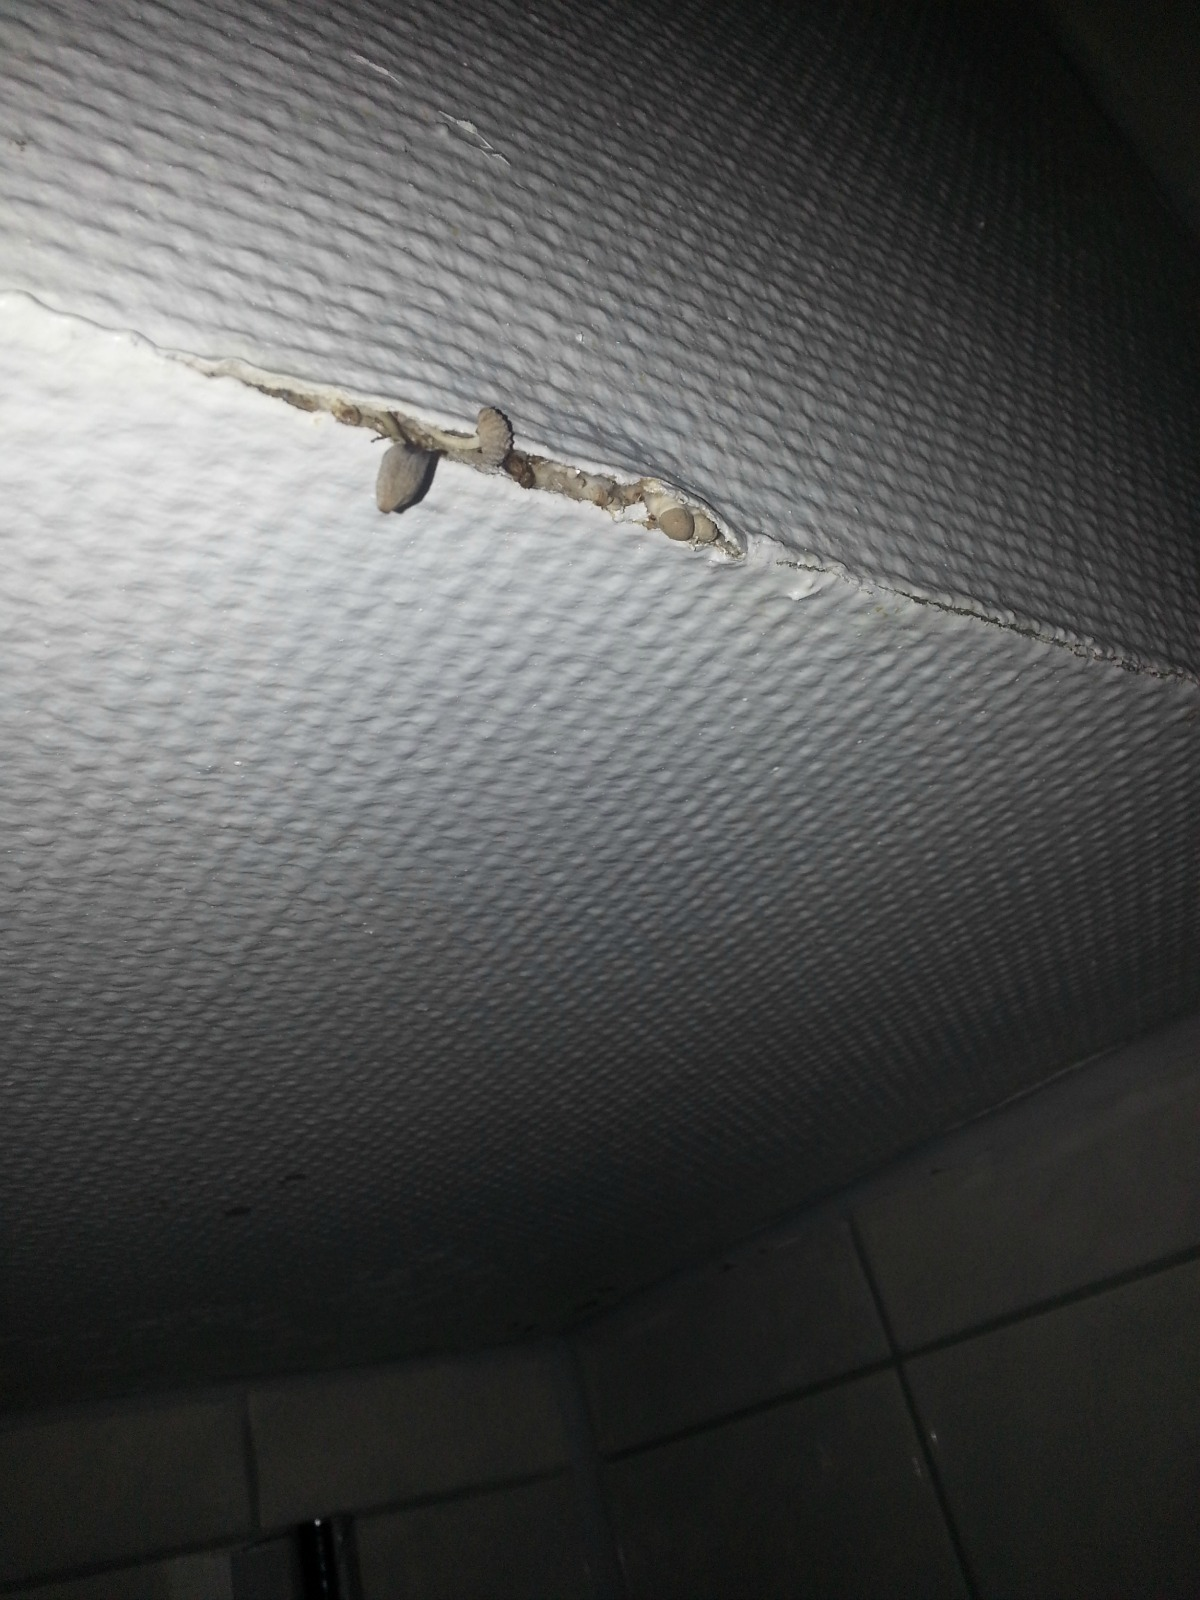 pilz aus der wand im raum der dusche gesundheit schimmel pilze. Black Bedroom Furniture Sets. Home Design Ideas